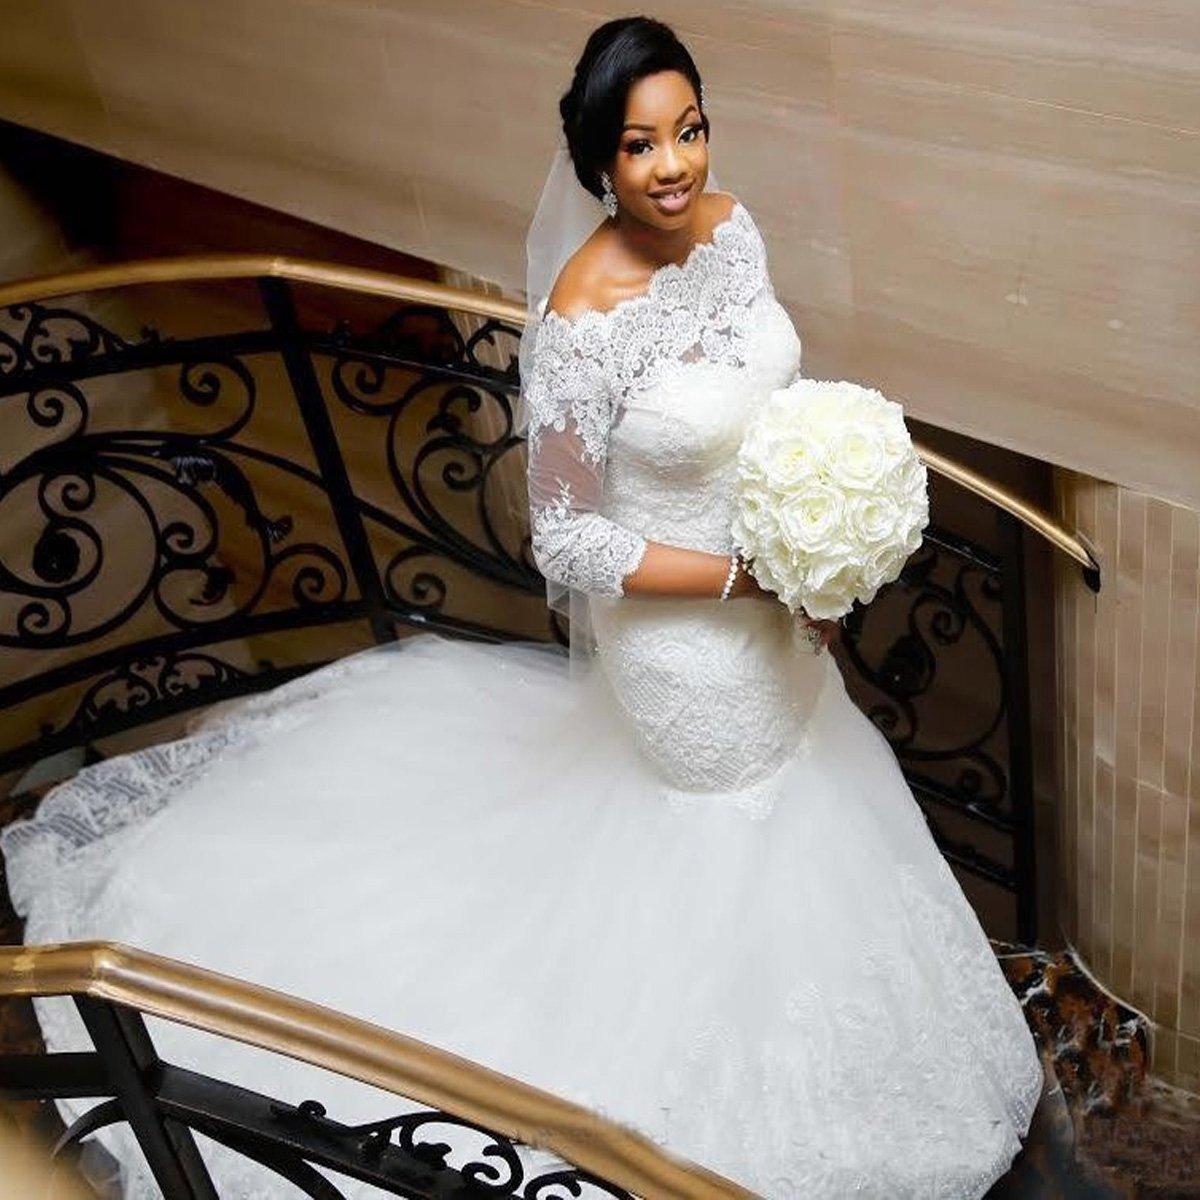 9a9ecca0ffa Yuxin Elegant Plus Size Wedding Dress 2018 Long Sleeves Appliqued Lace  Mermaid Bridal Gowns at Amazon Women s Clothing store